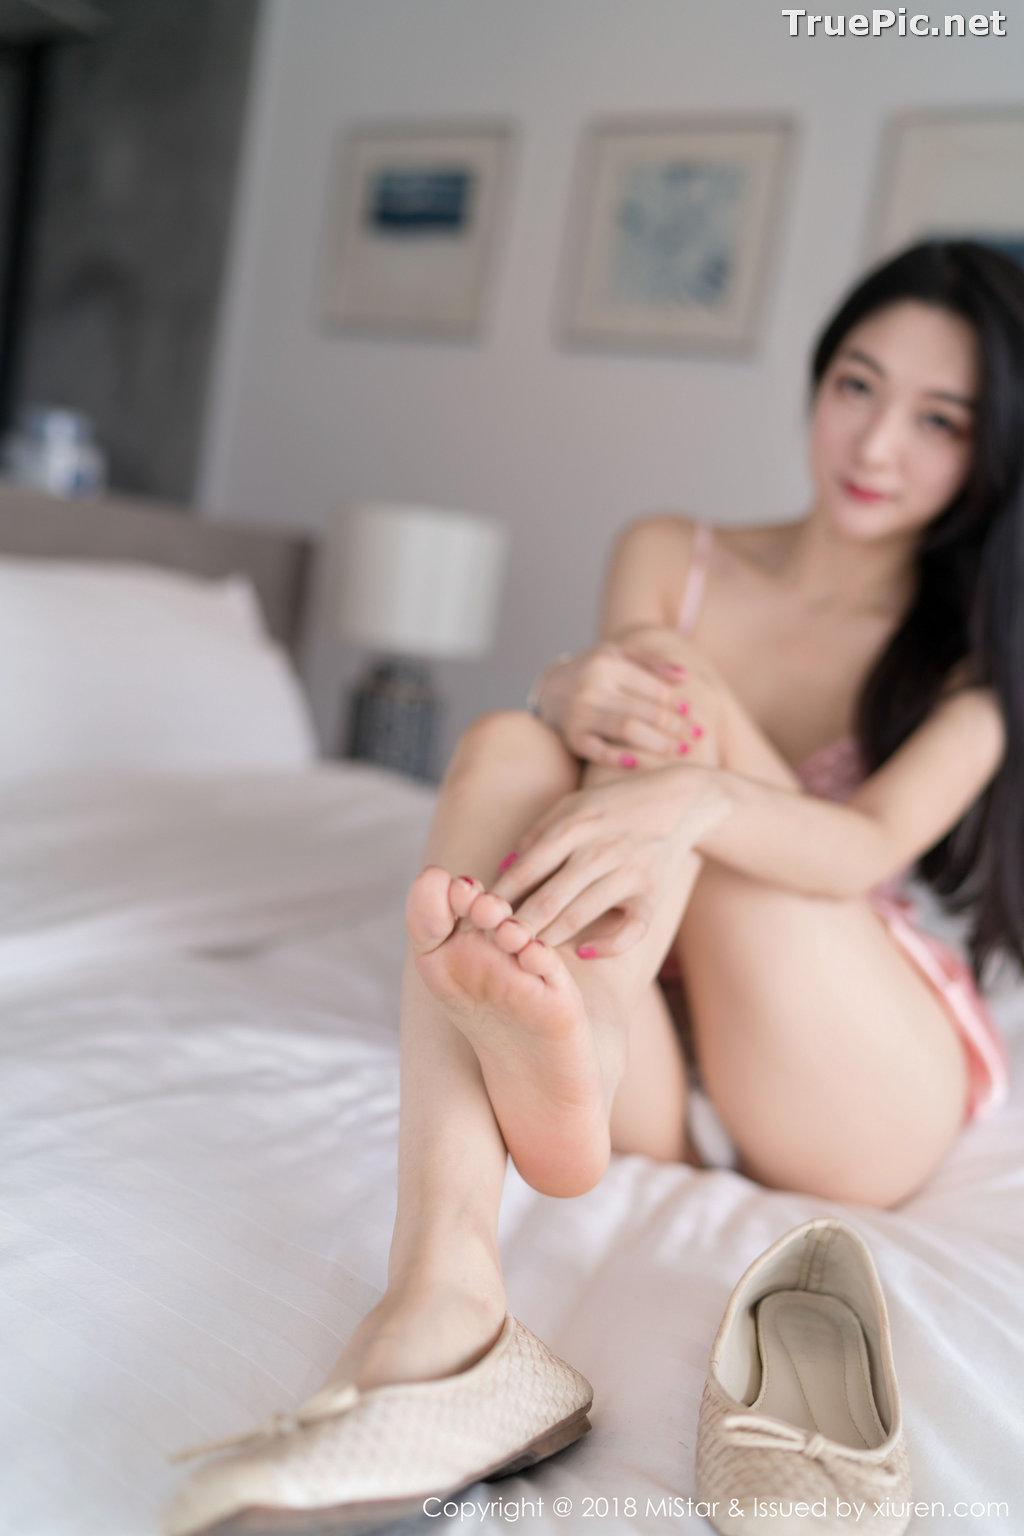 Image MiStar Vol.238 - Chinese Model - Xiao Reba (Angela小热巴) - Sleep Dress and Monokini - TruePic.net - Picture-13